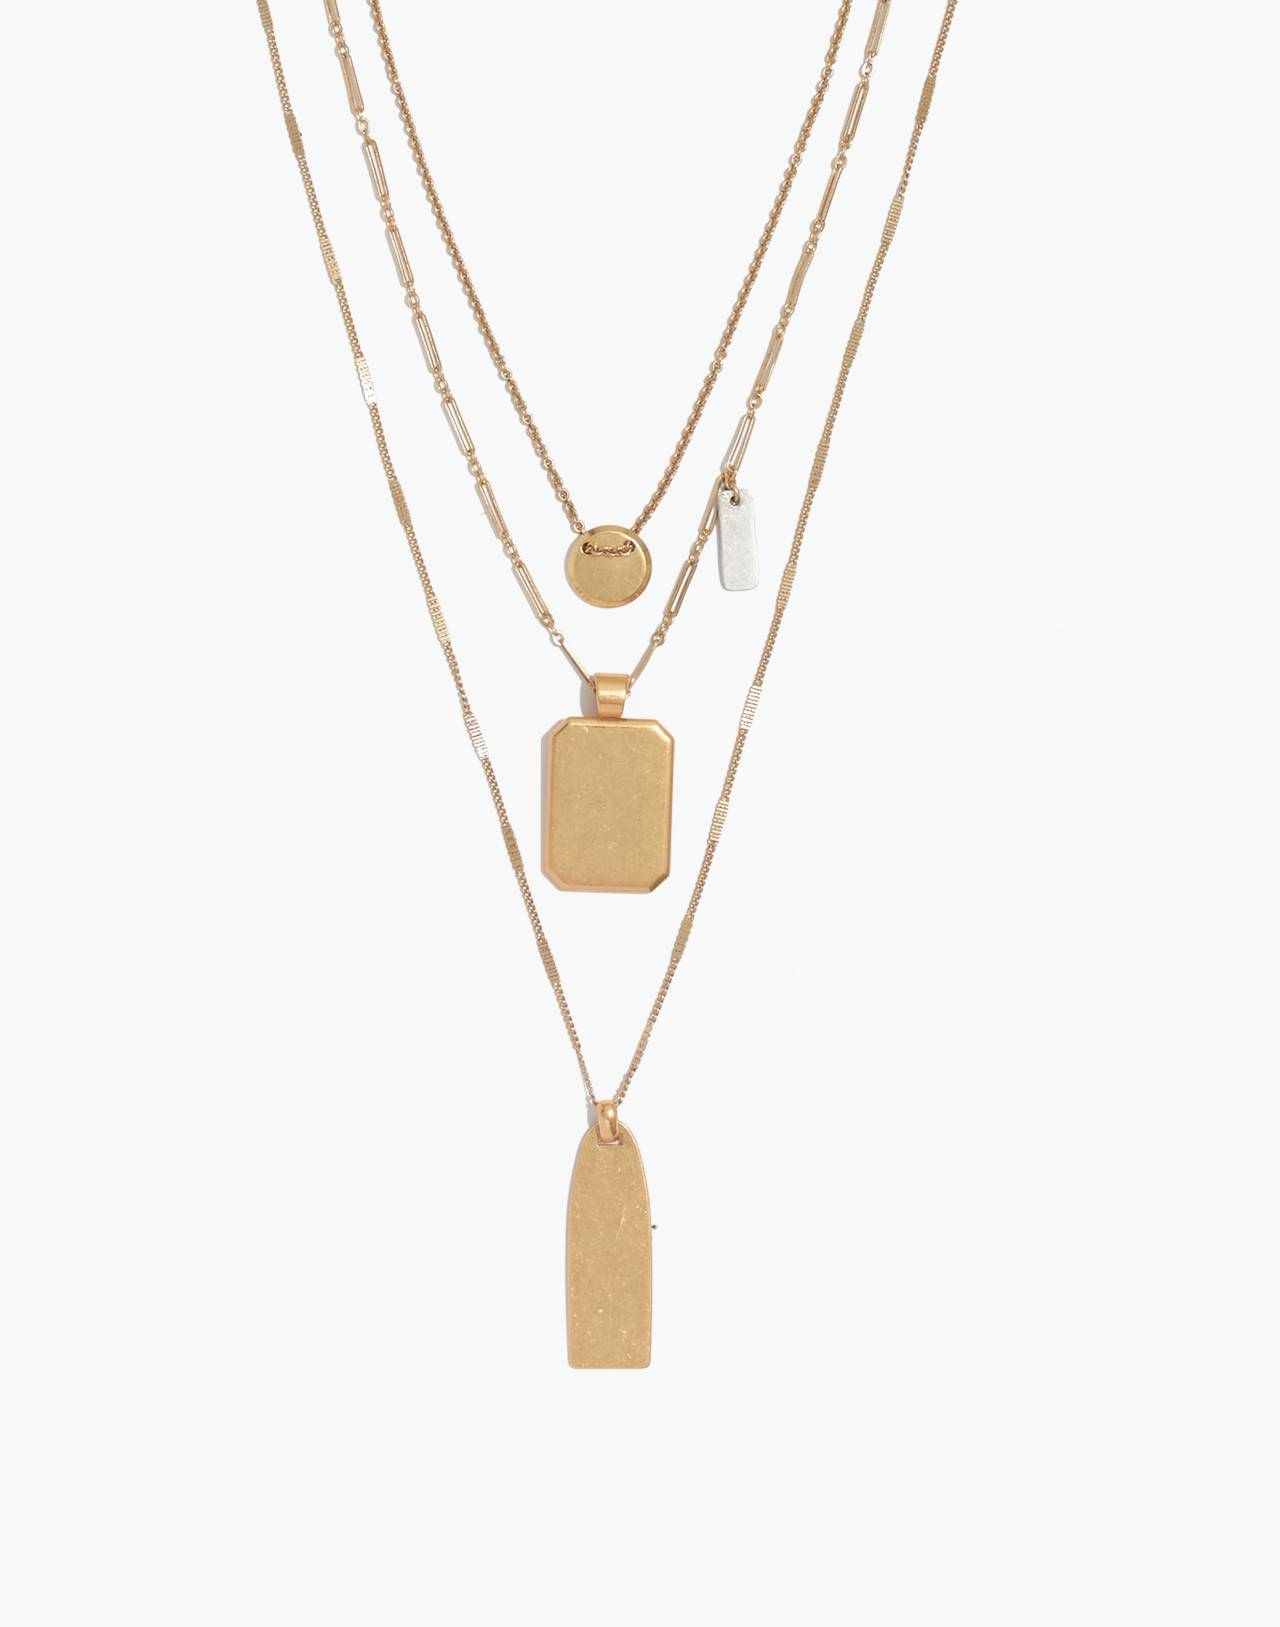 Treasure Pendant Necklace Set in mixed metal image 1